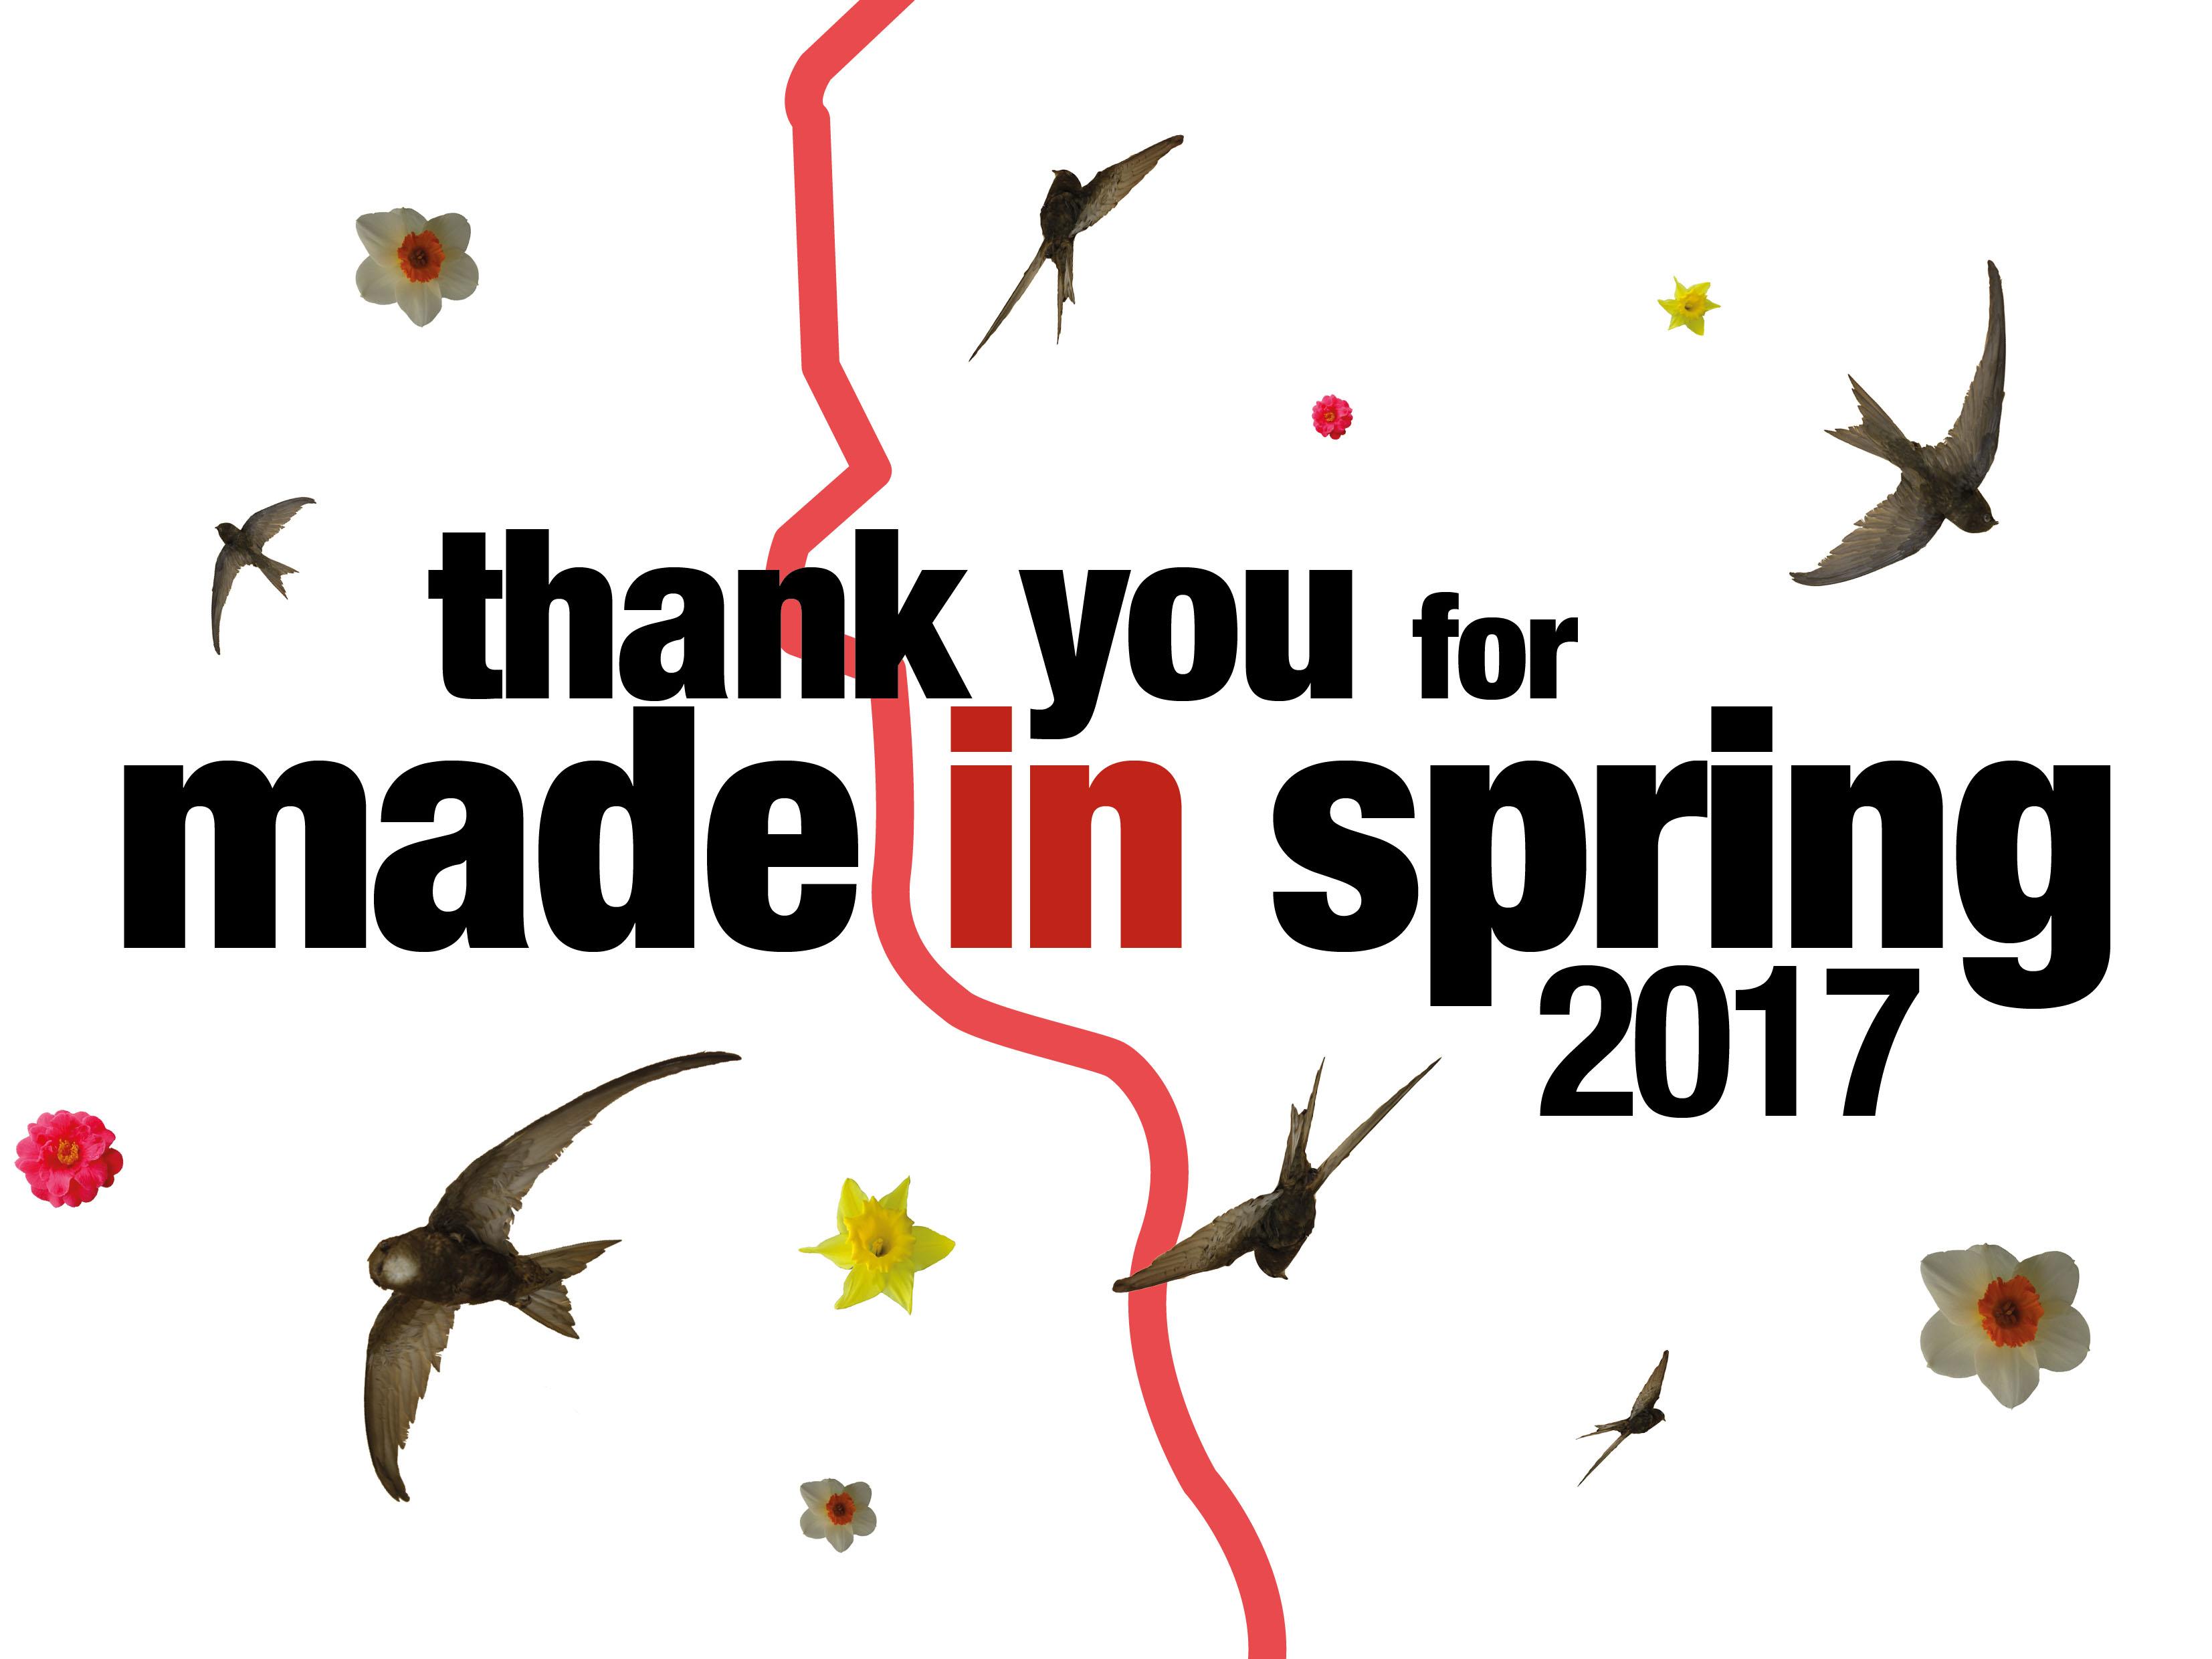 masdeinspring2017-thankyou-sq